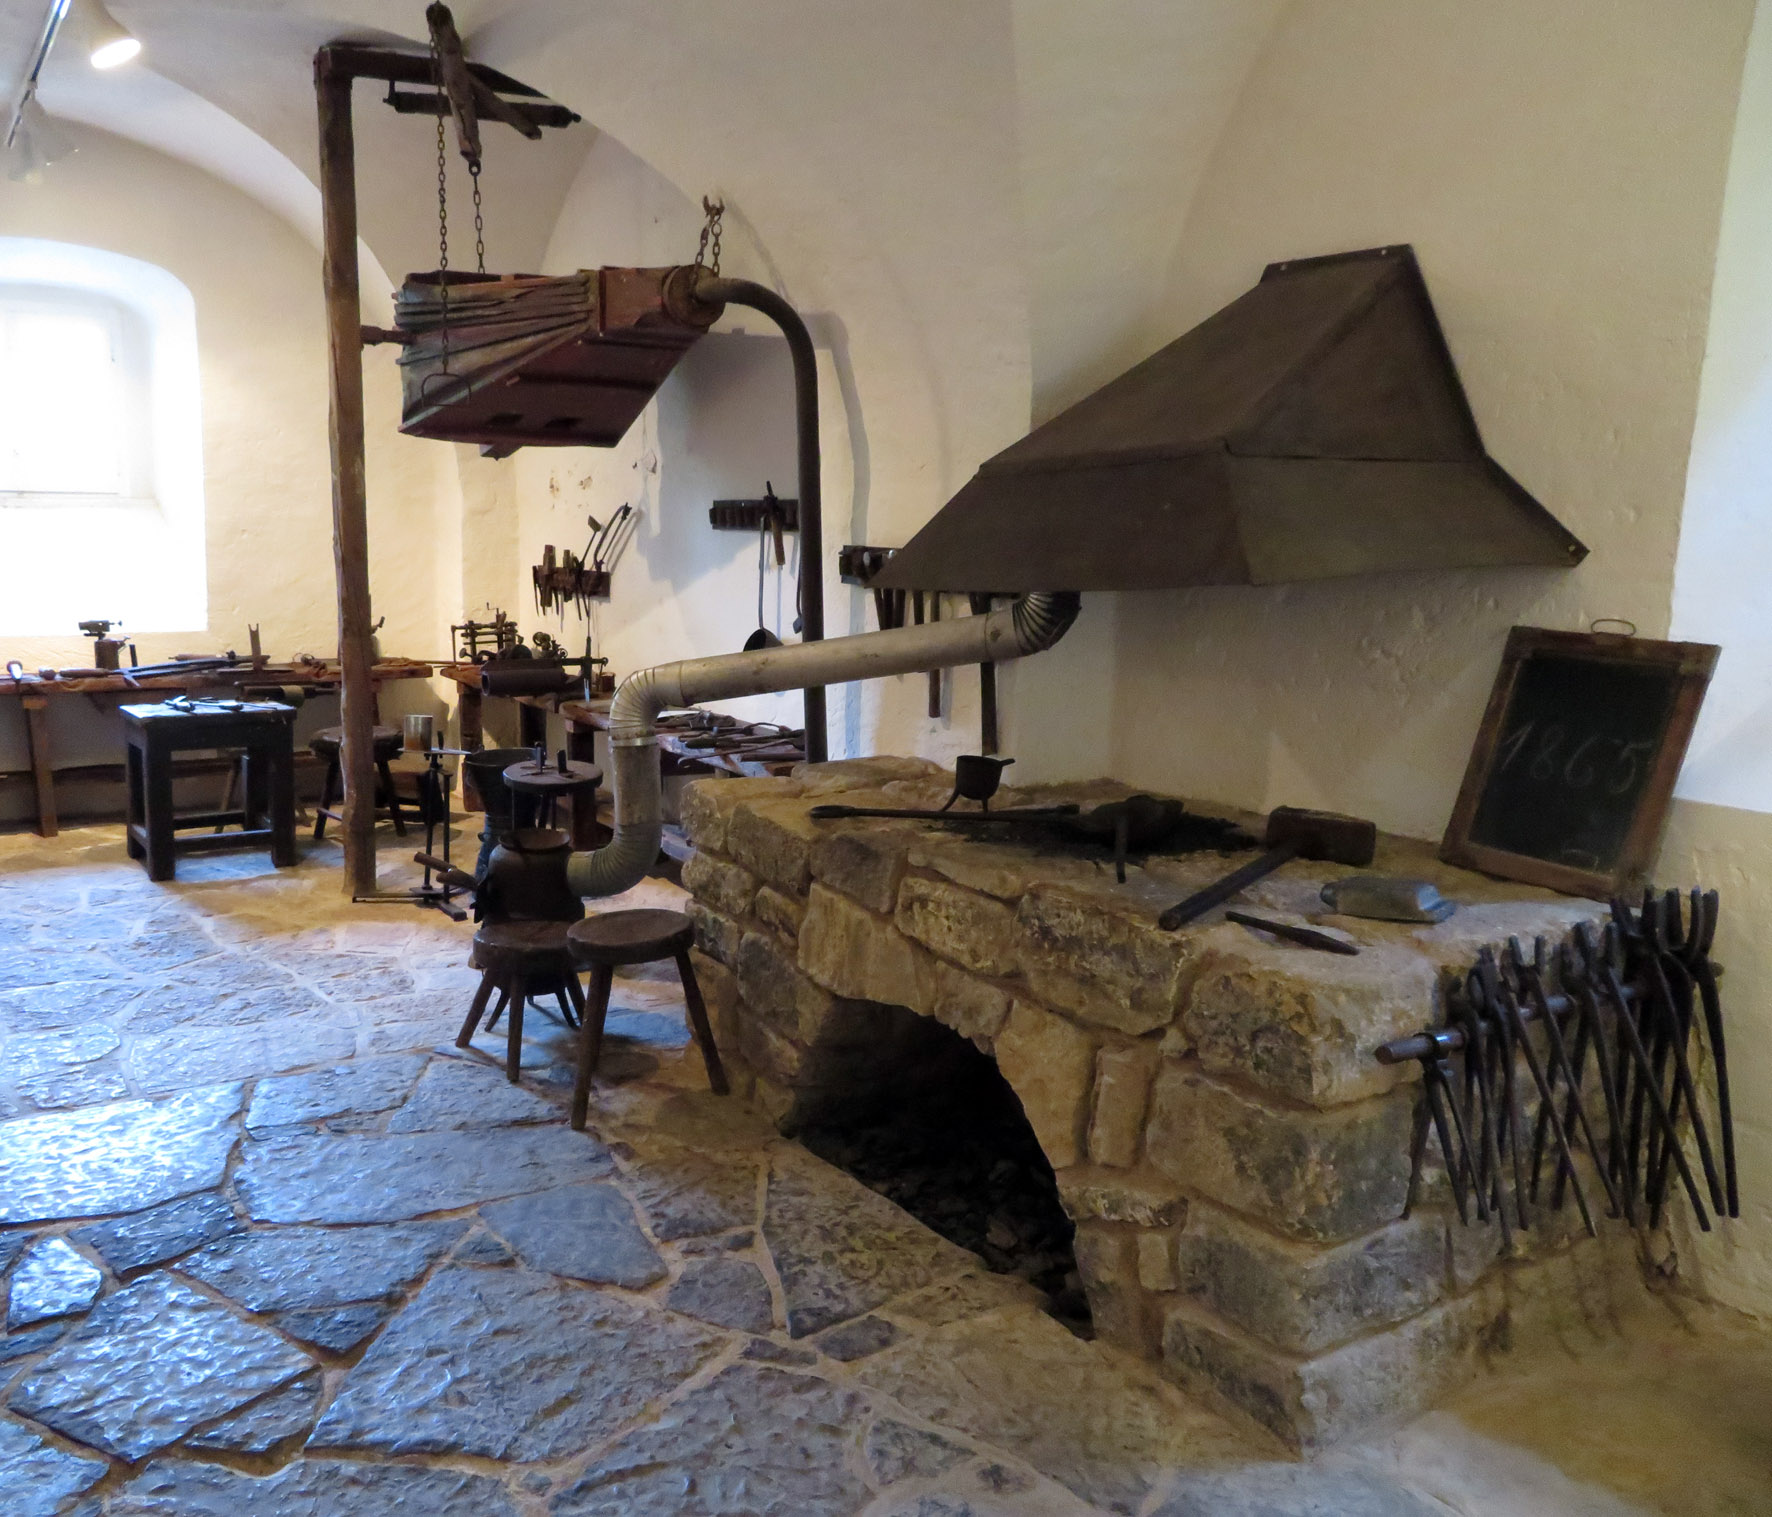 Städtisches-Museum-Seesen-im-alten-Jagdschloss-Klempnerwerkstatt